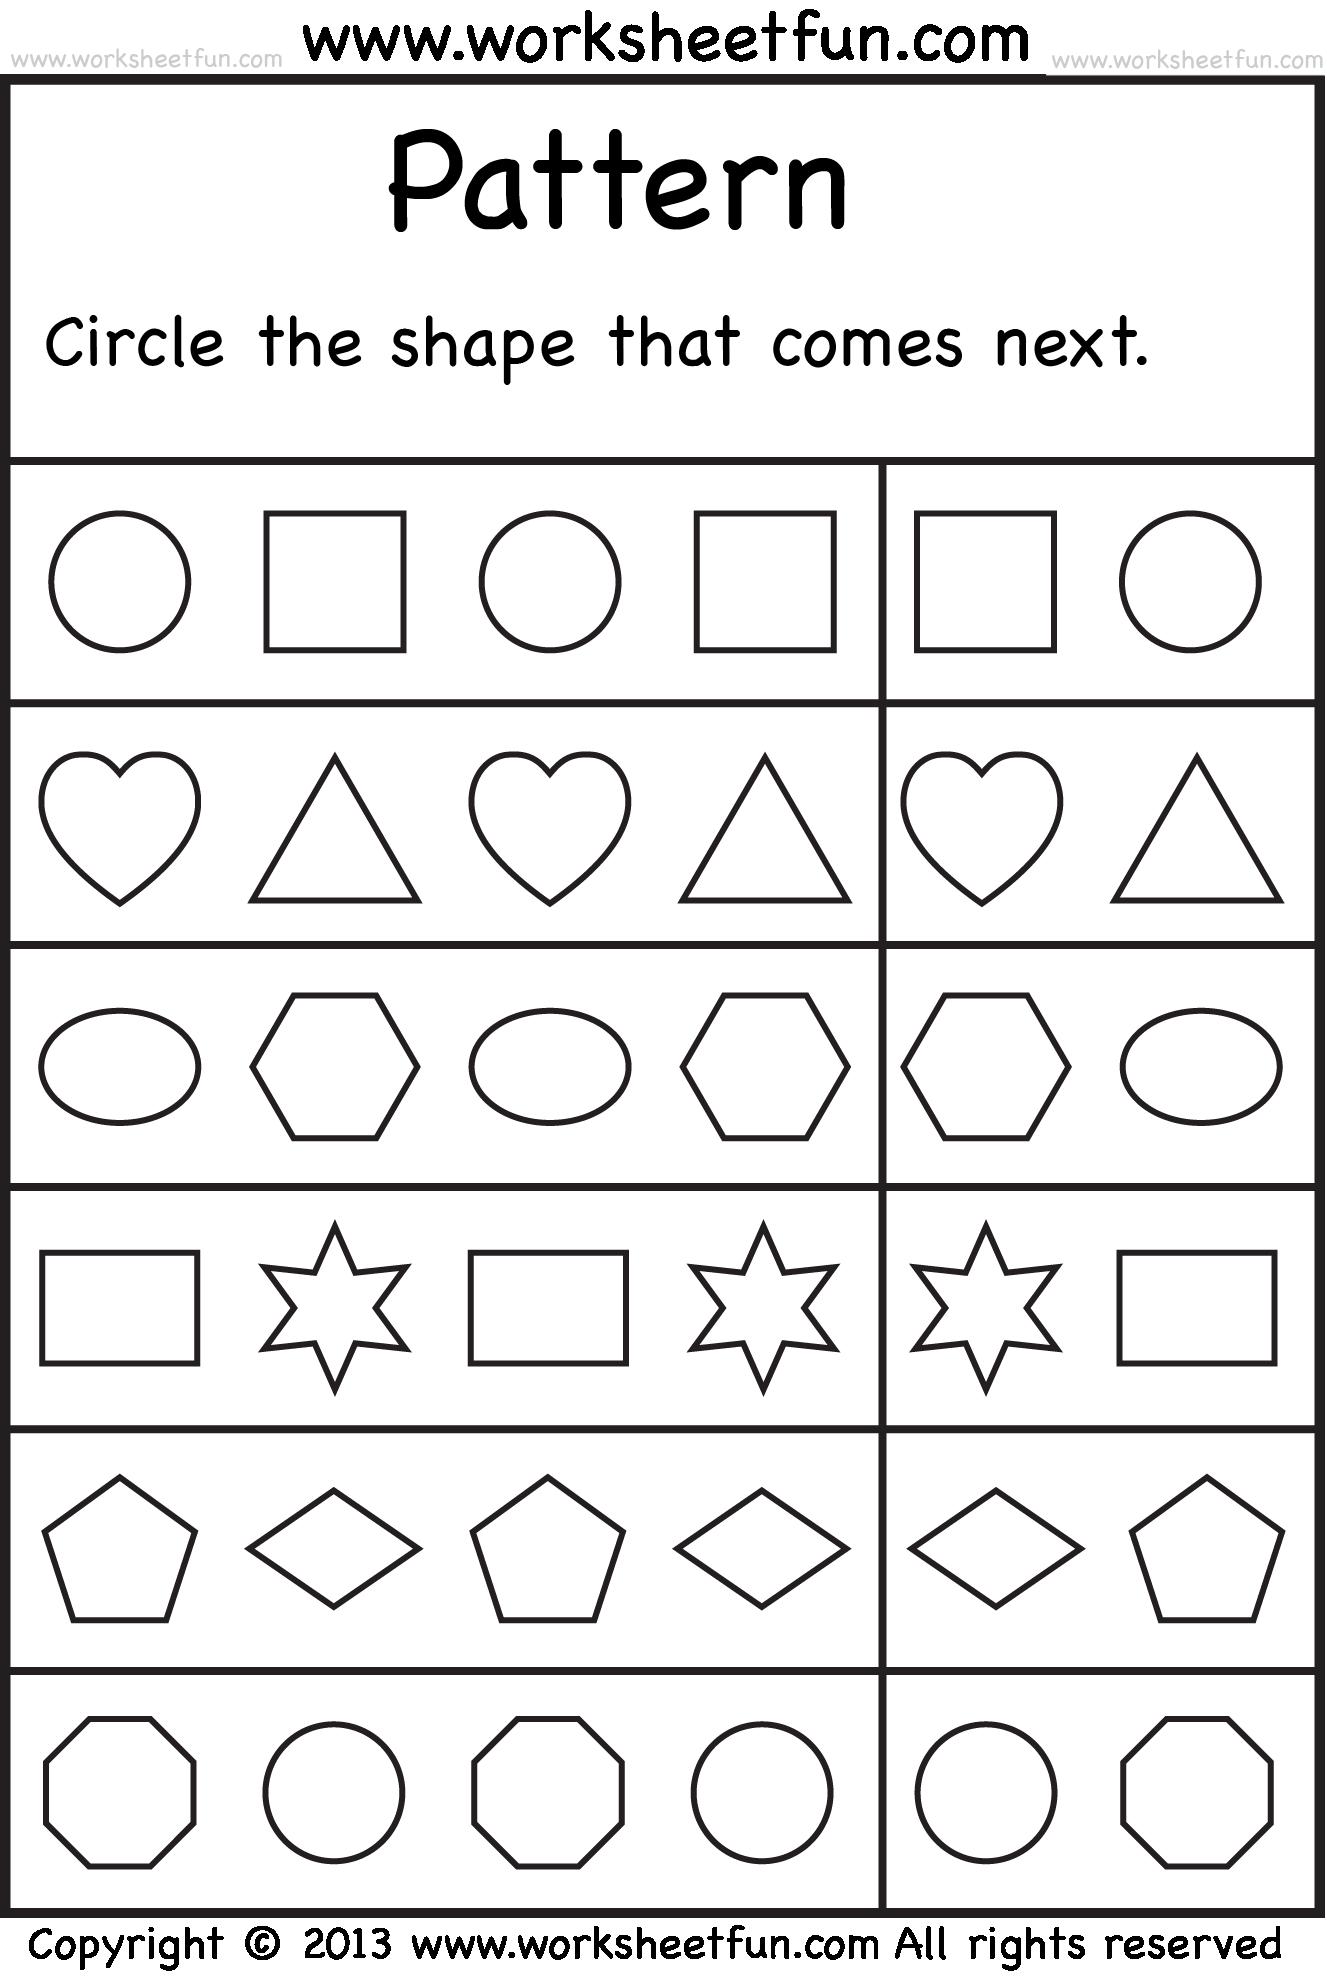 Free Kindergarten Patterns Worksheets Printable 1102033